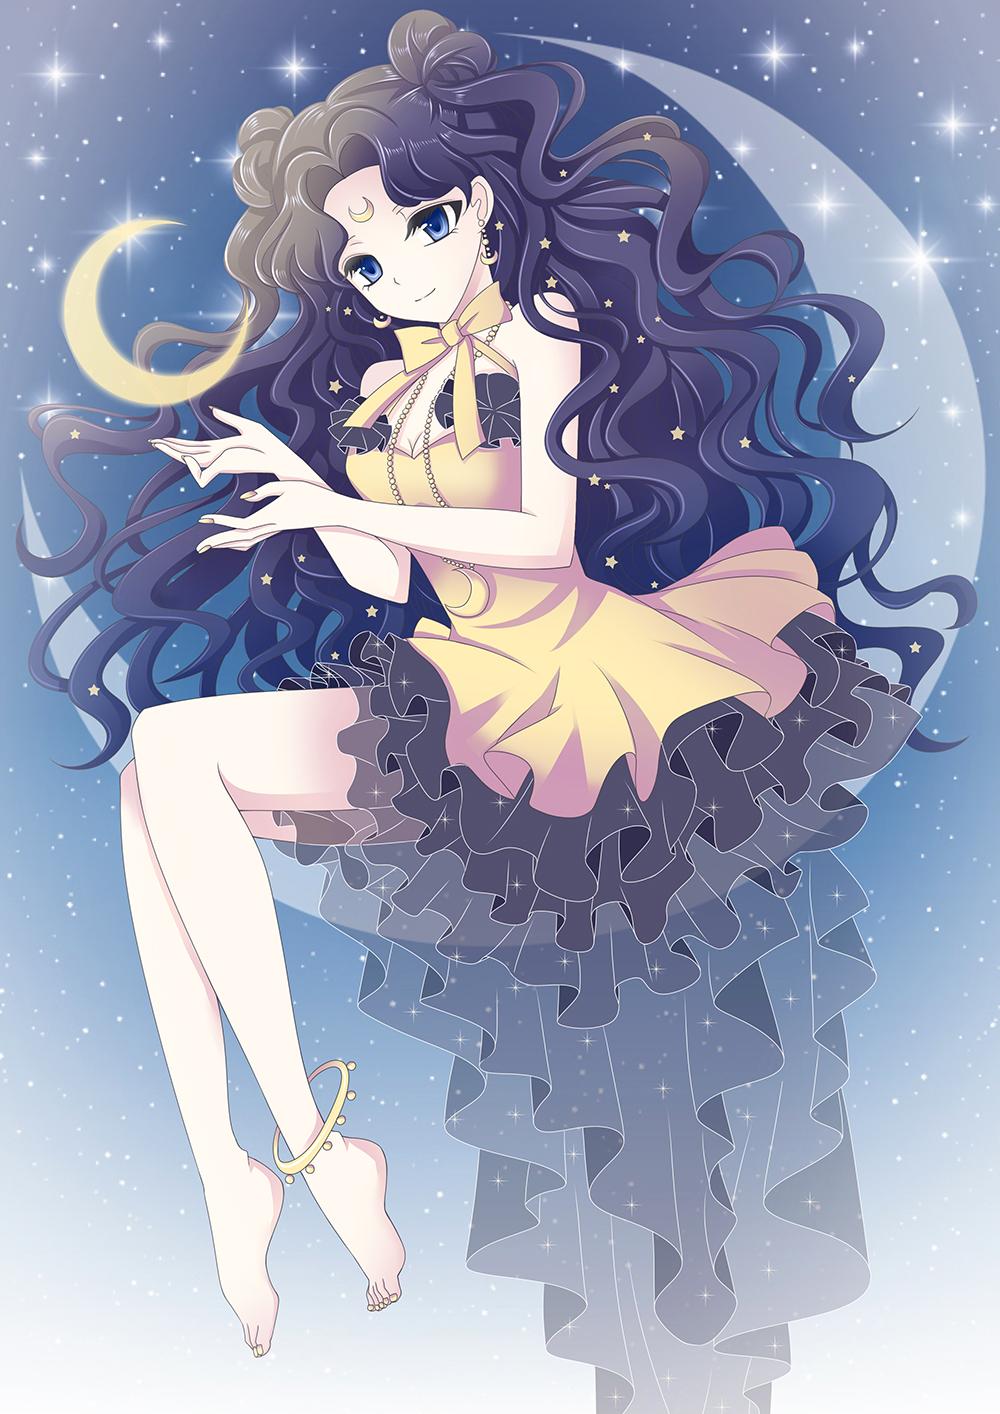 Human Luna Luna Sailor Moon Image 2320013 Zerochan